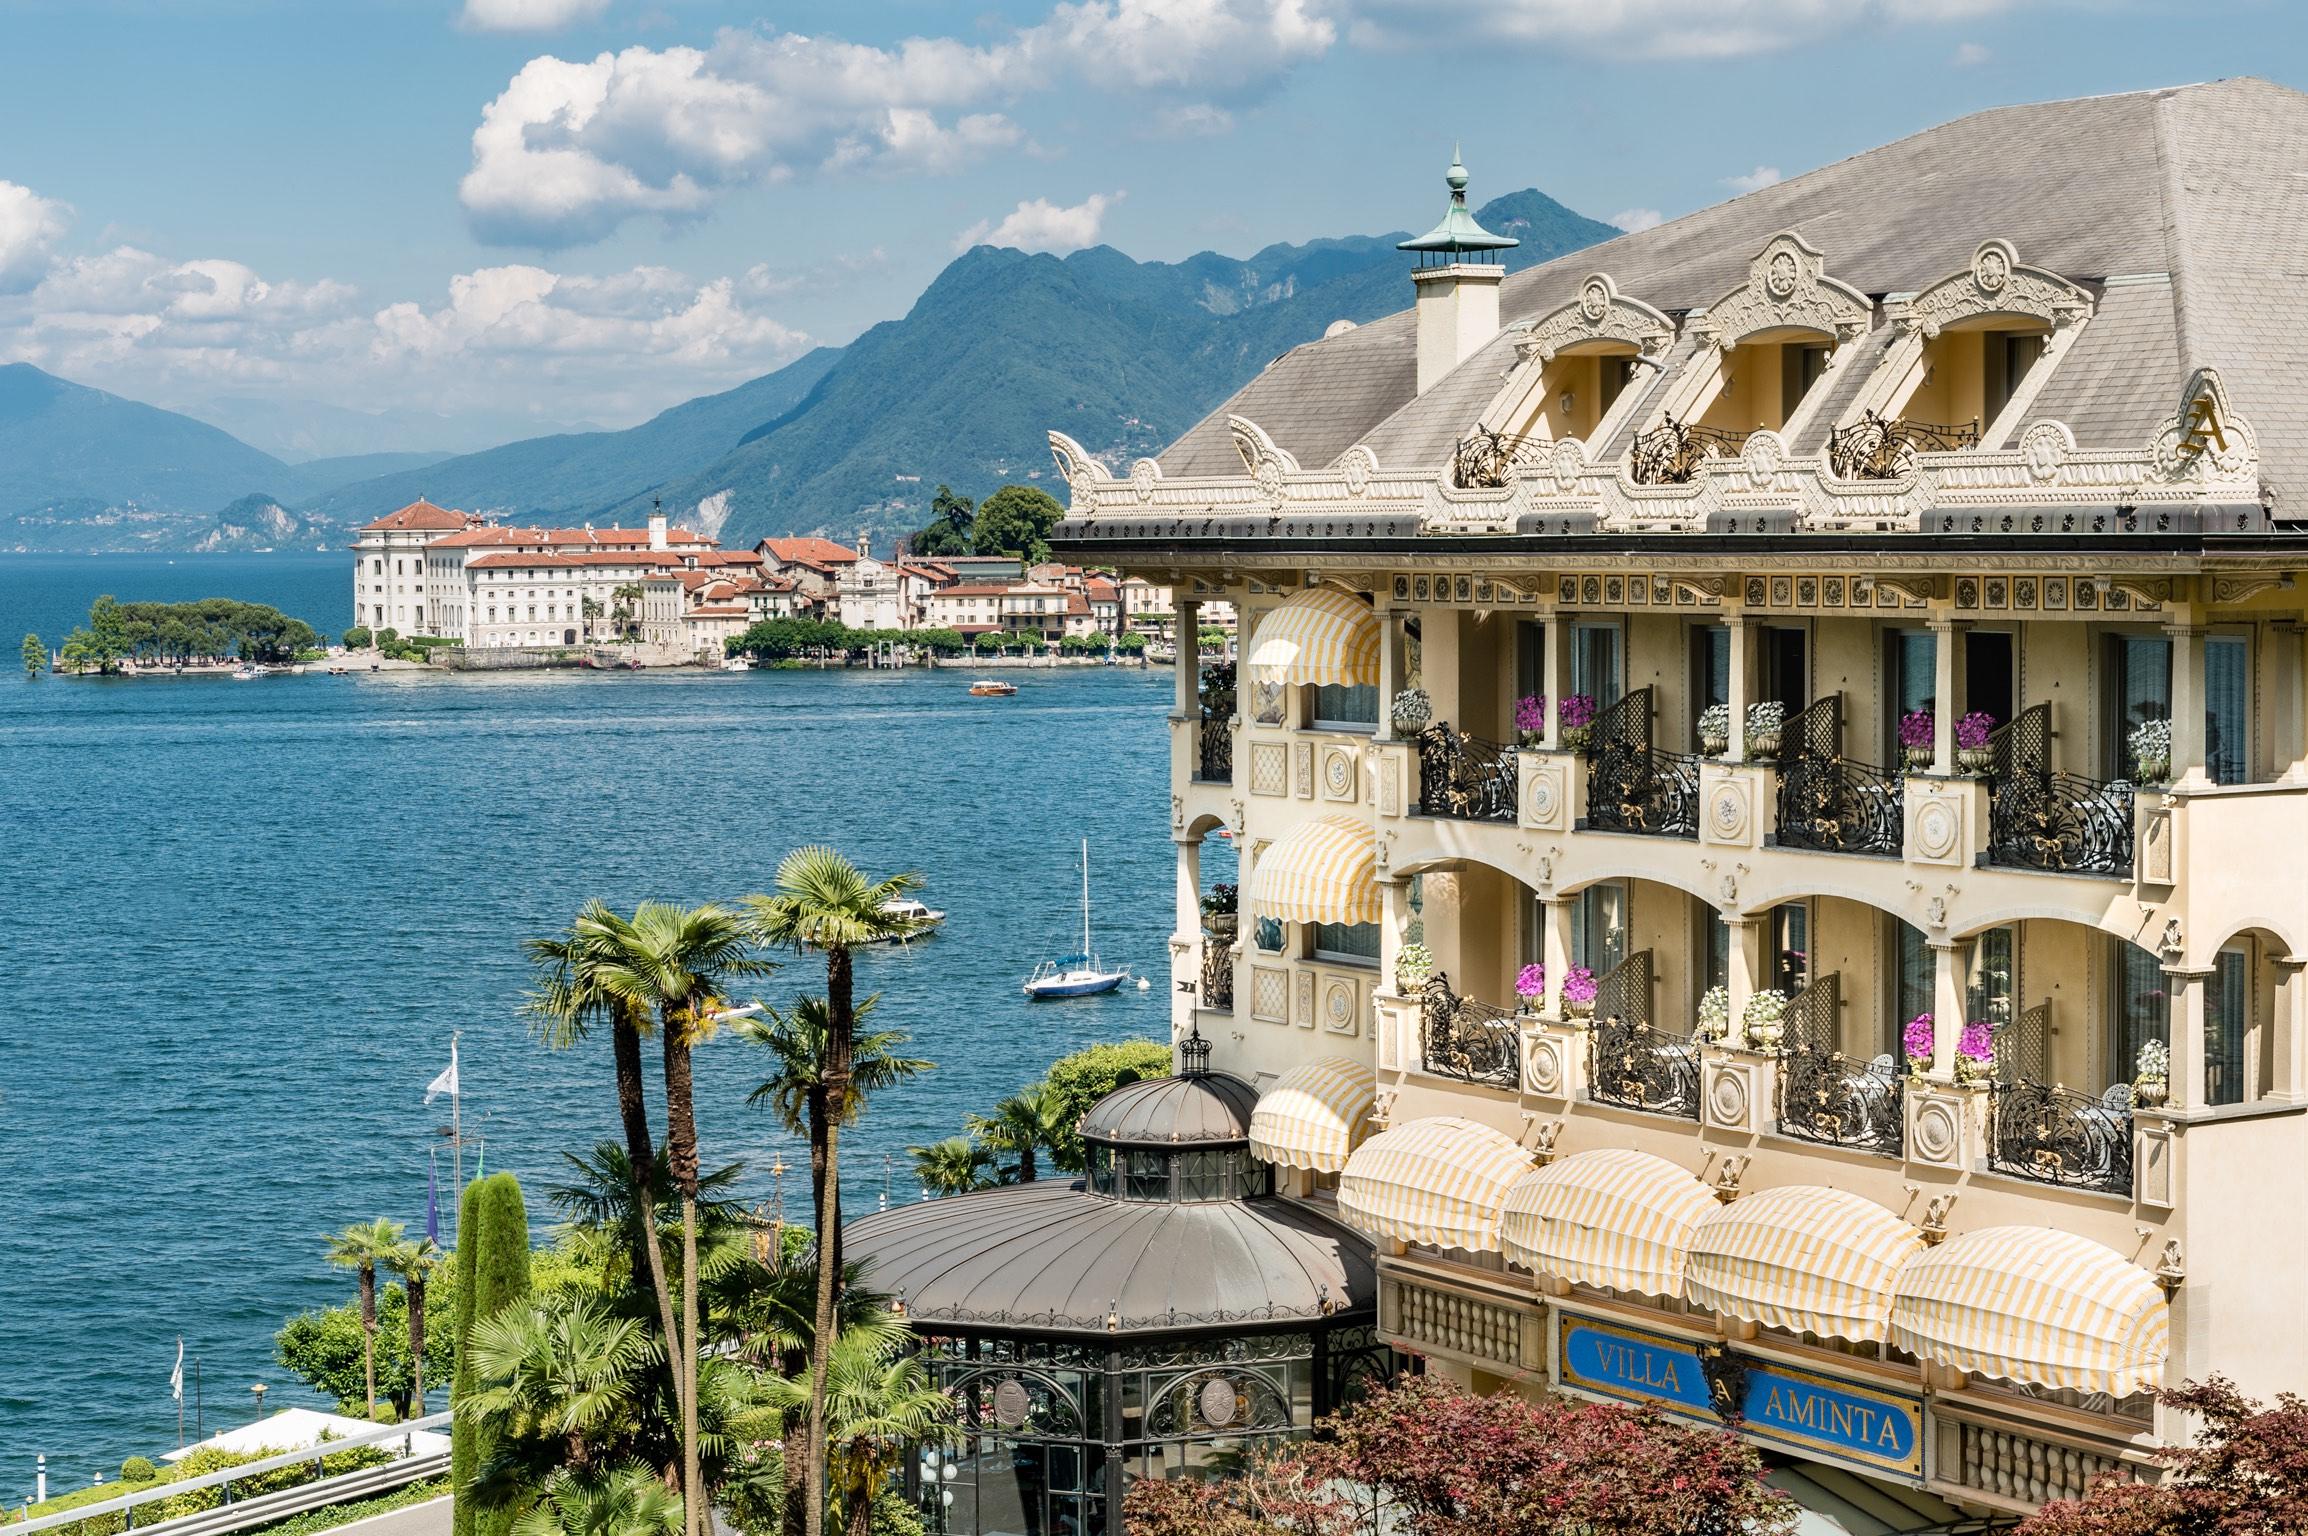 Hotel facade overlooking island in Italy